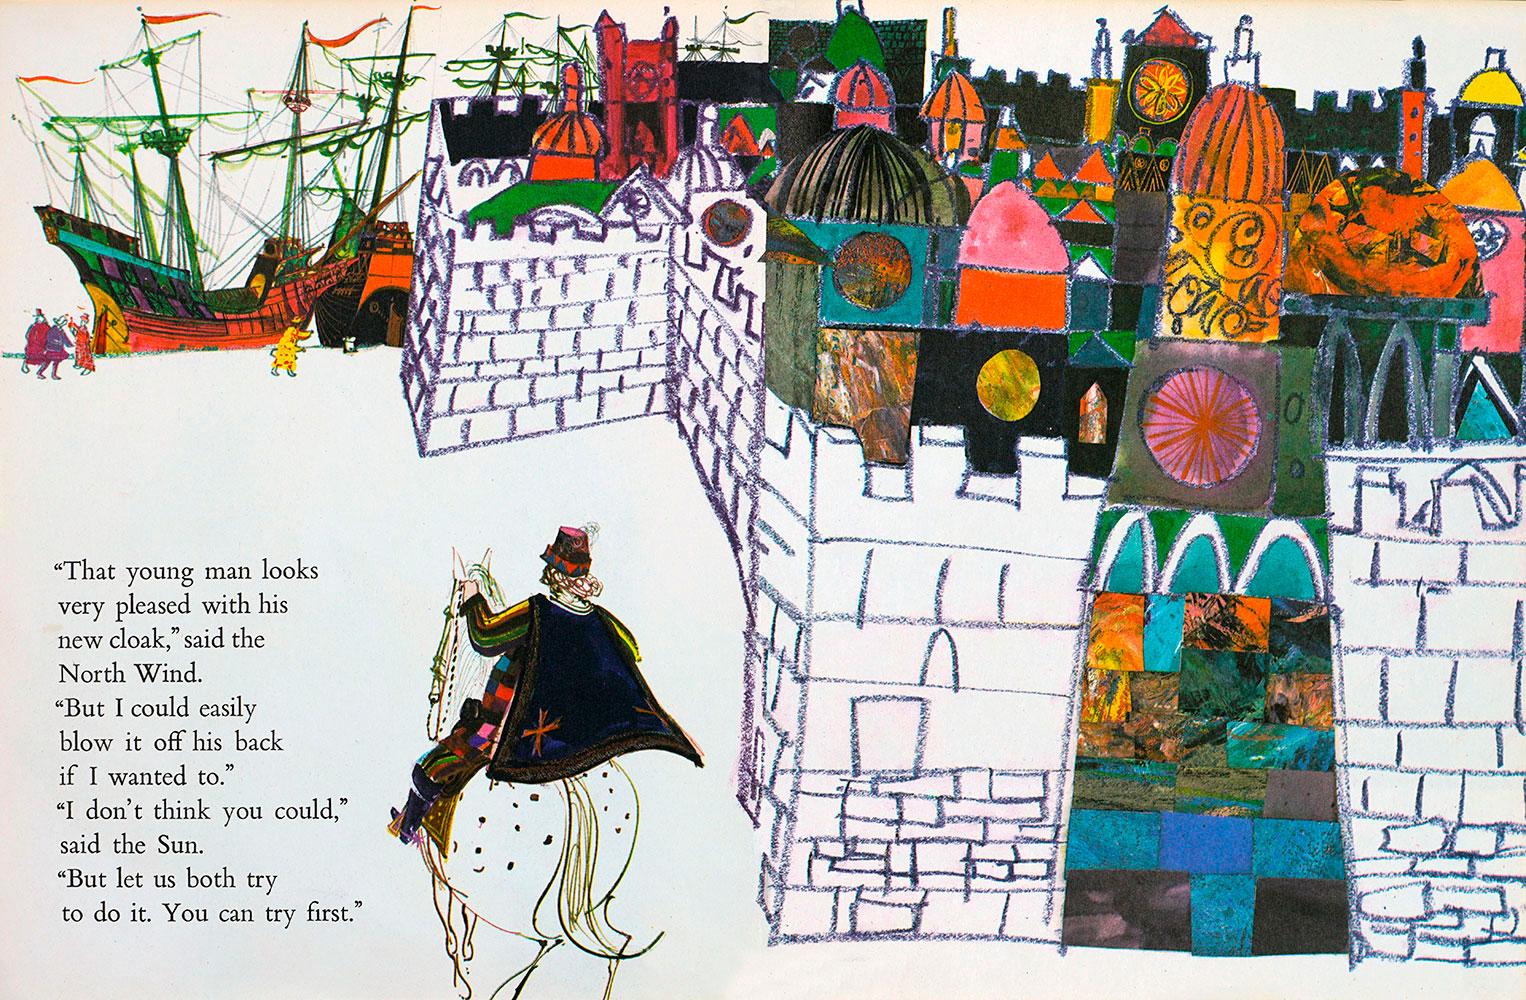 la-fontaine-the-north-wind-and-the-sun-book-page-5-&-6-brian-wildsmith.jpg